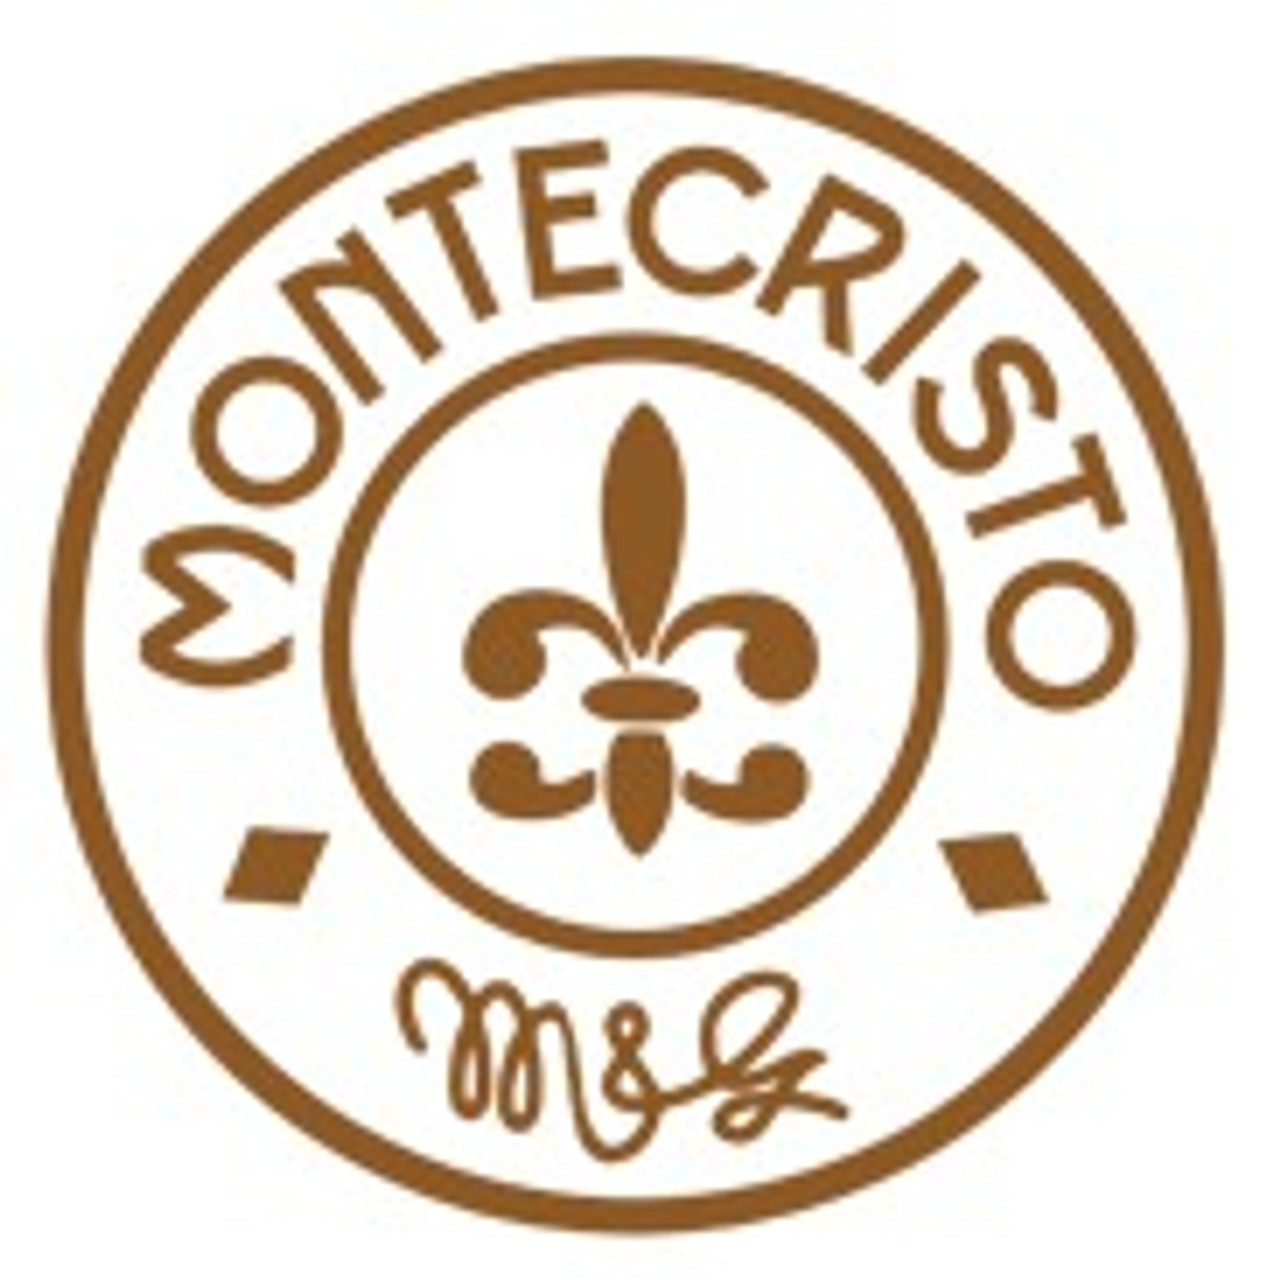 Montecristo Robusto Cigars - 5 x 50 (Box of 25)